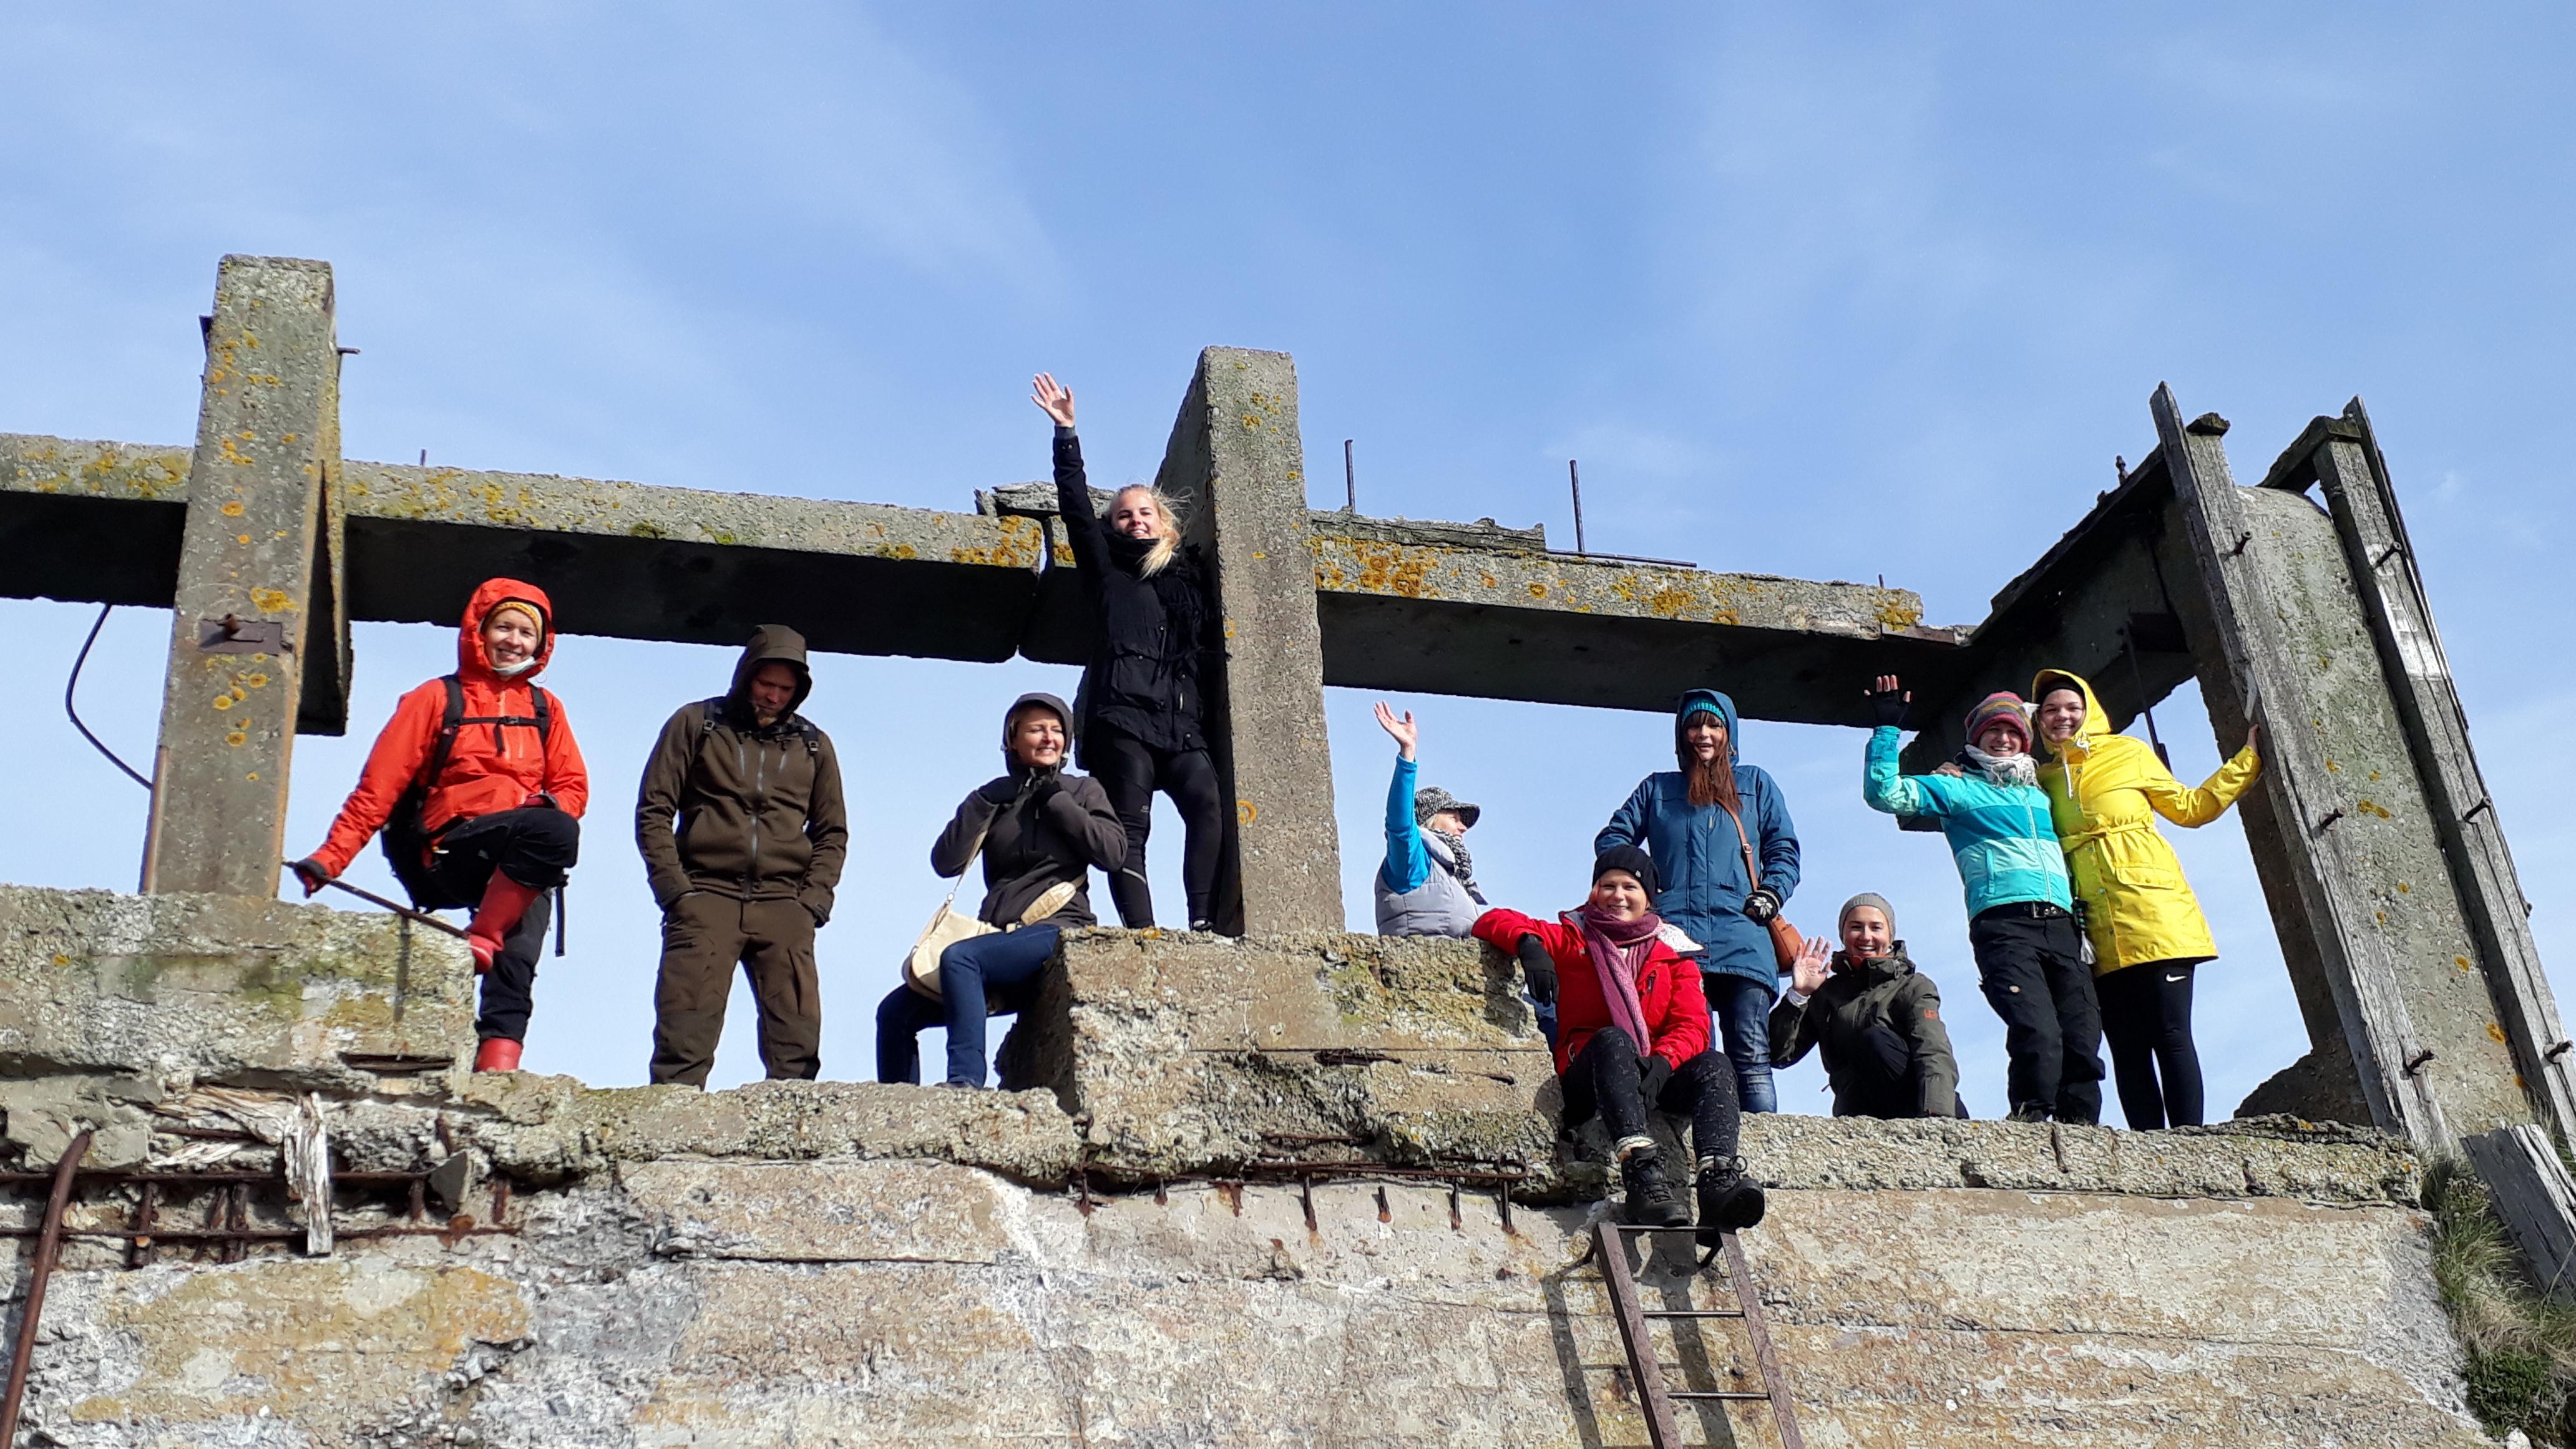 Prangli Travel team